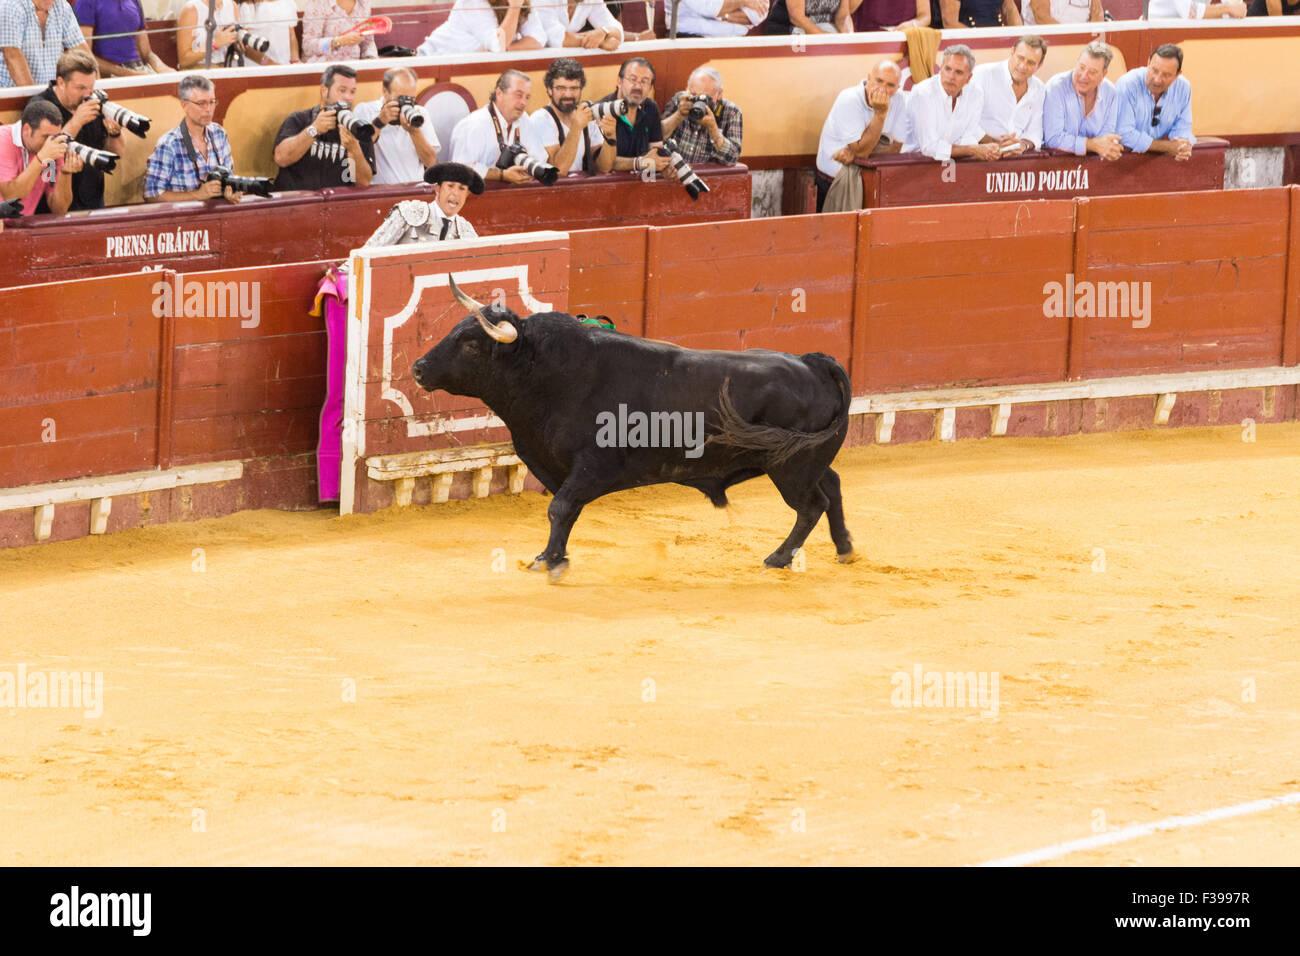 Bull fighting in Spain / Corrida de Toros en España Stock Photo